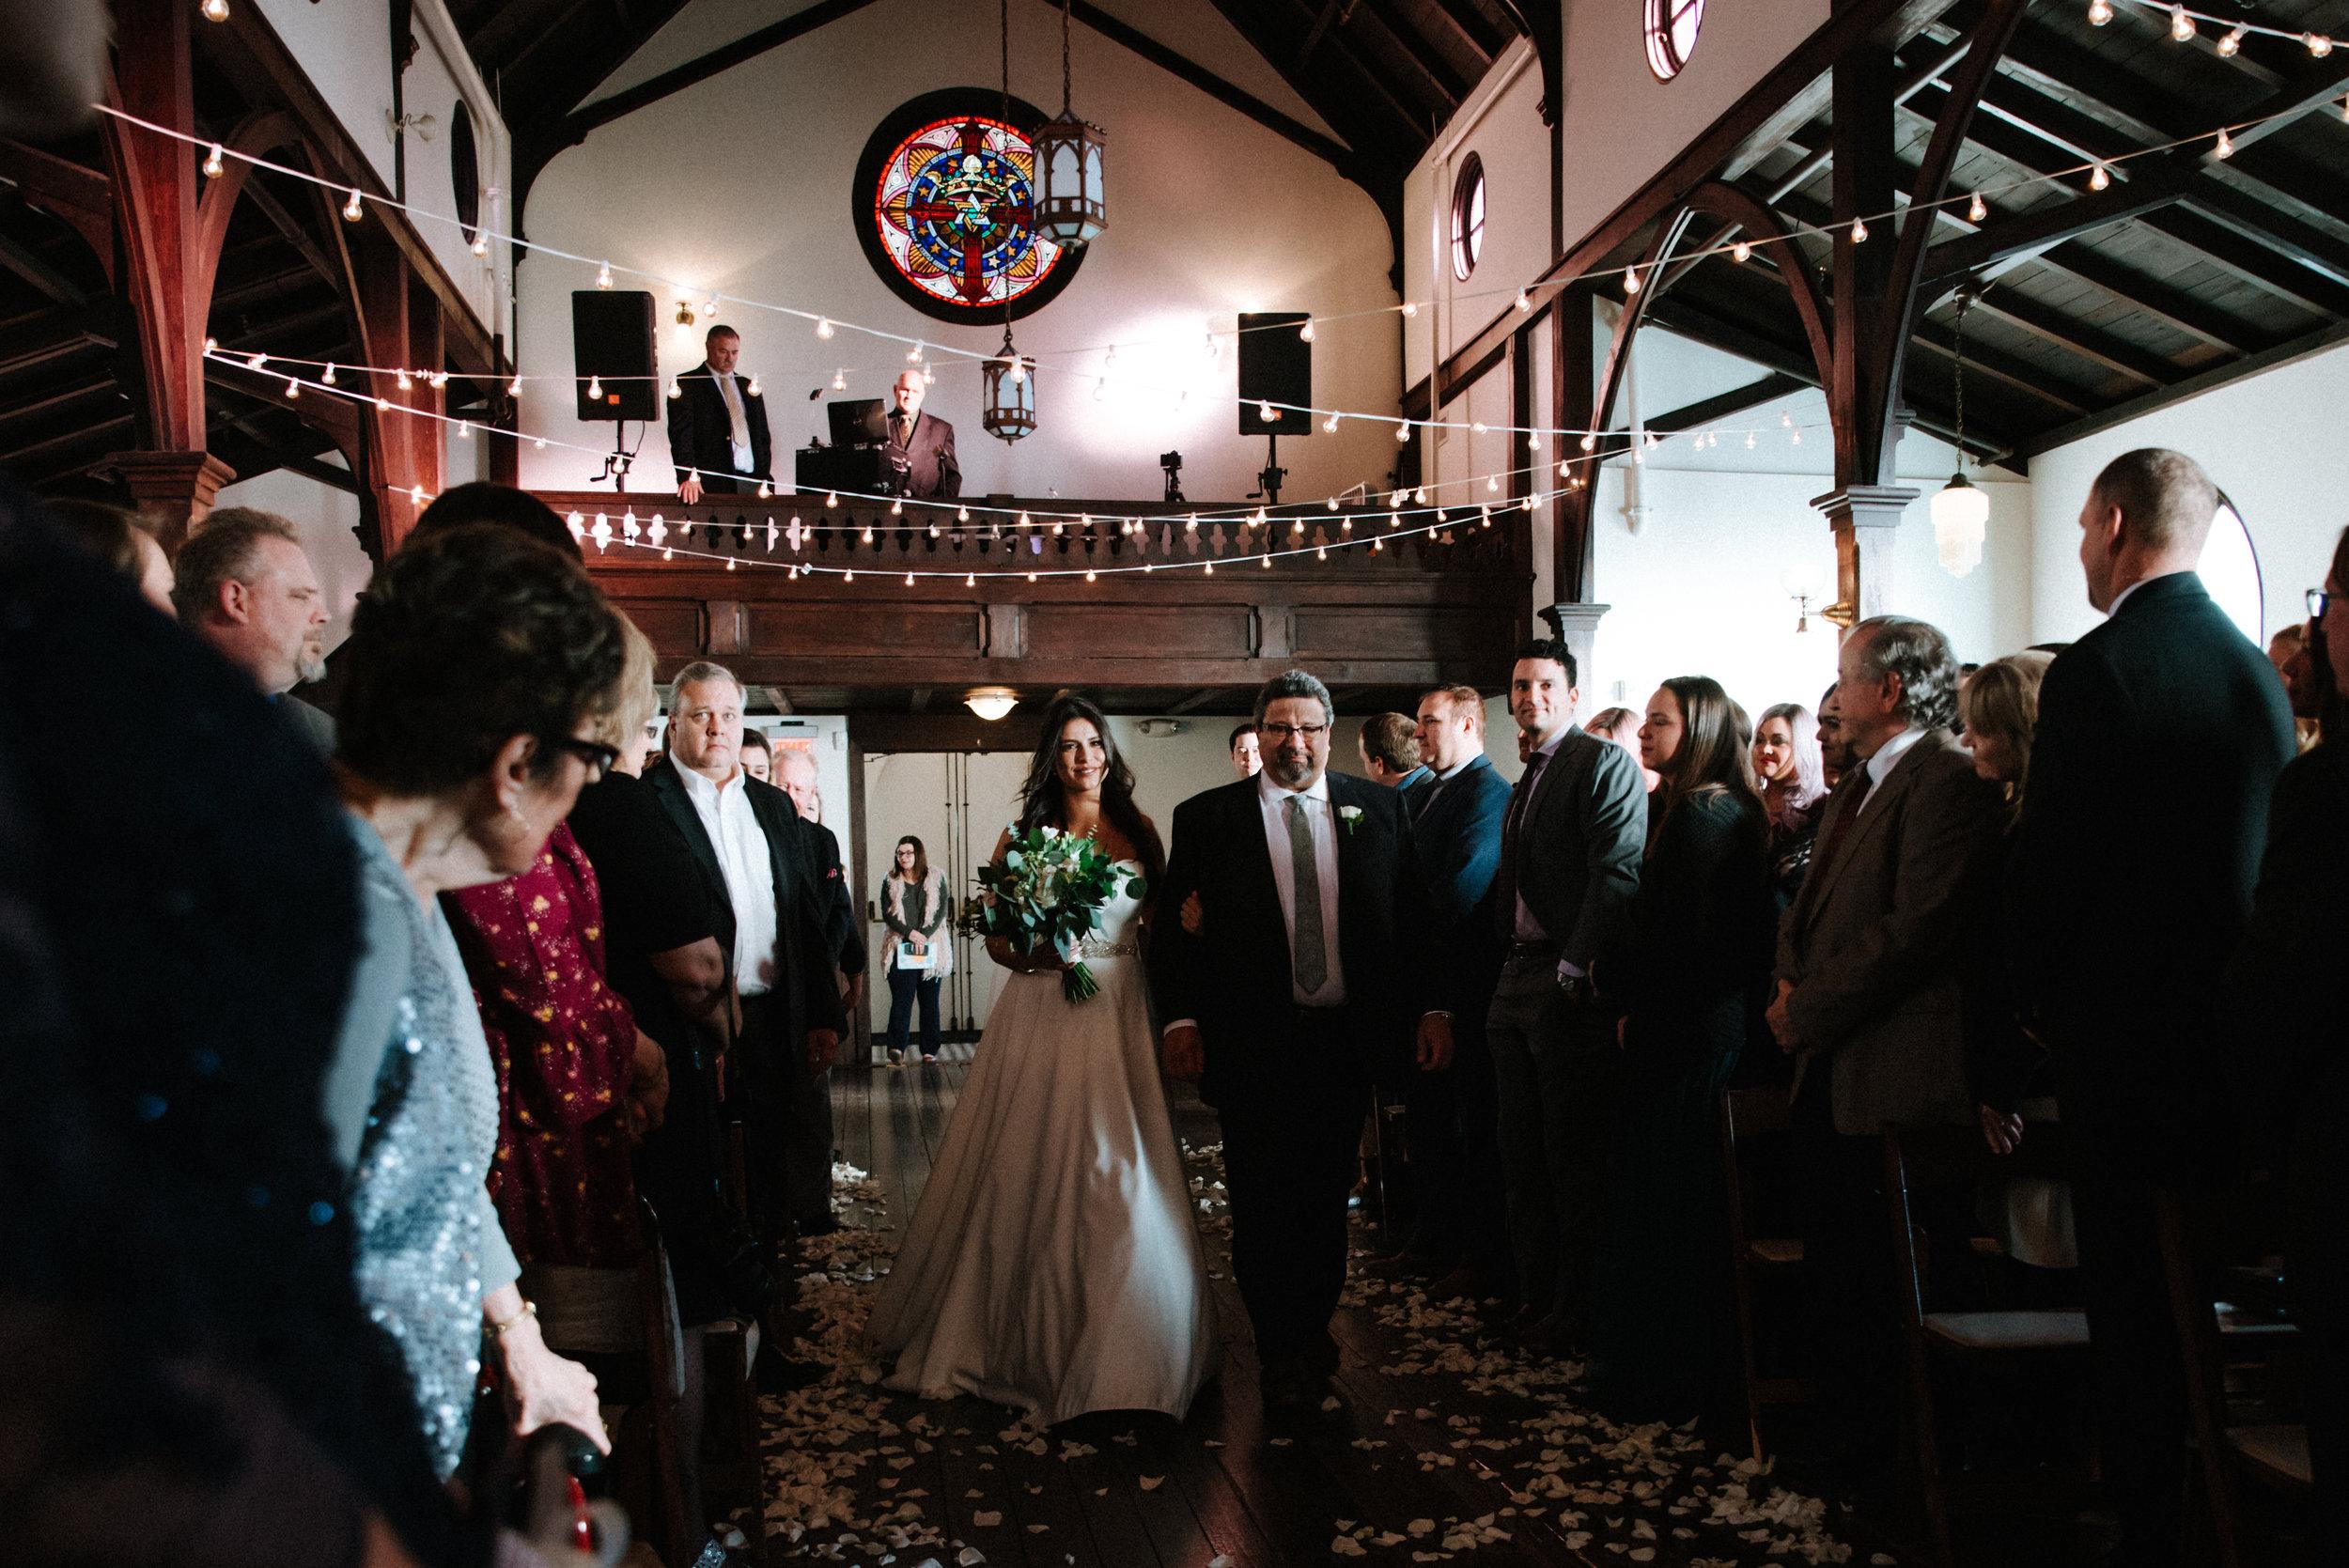 +Raleigh Wedding +North Carolina +Photographer +Wedding Photographer +Engagement Photographer +All Saints Chapel-6729.jpg